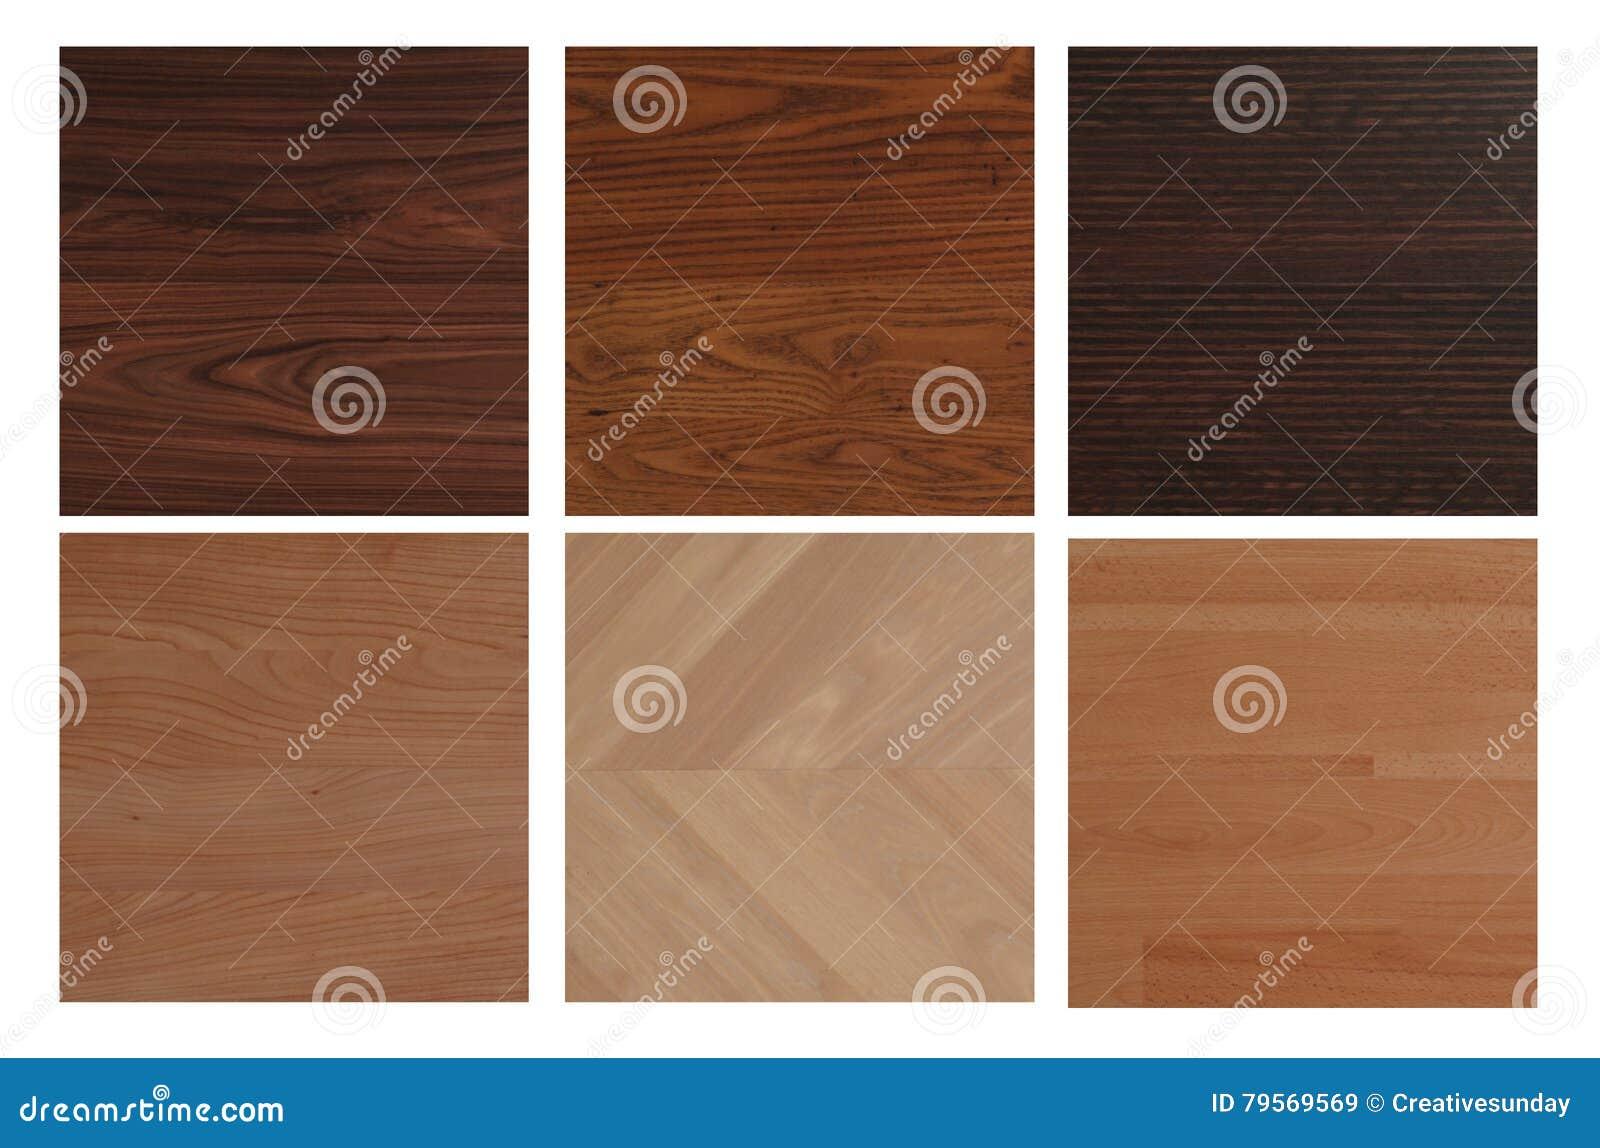 Woof Floor Stock Image Image Of Hardwood Laminate Home 79569569